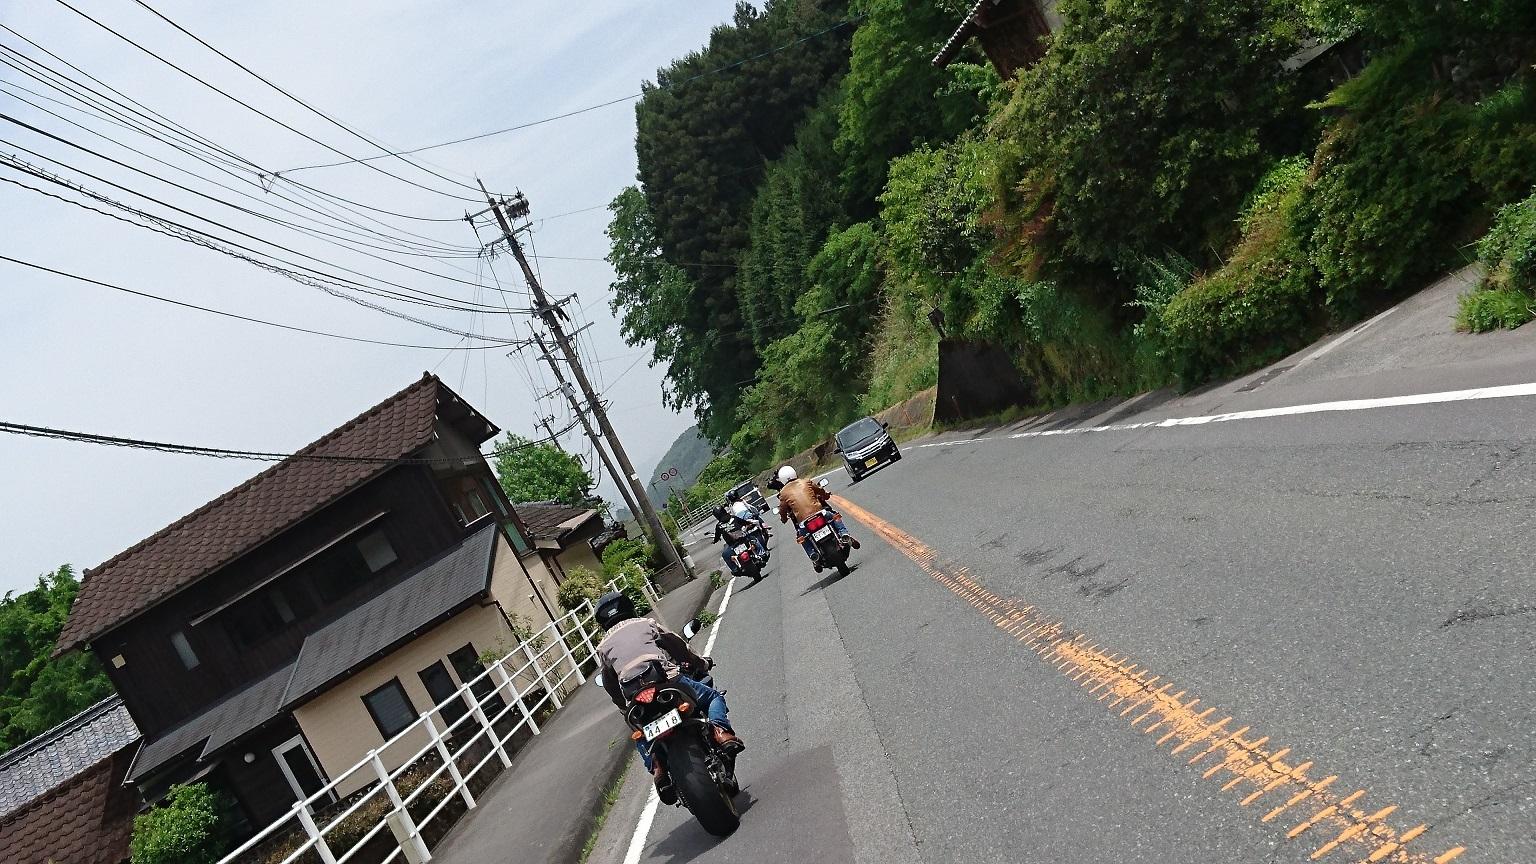 DSC_6326.jpg